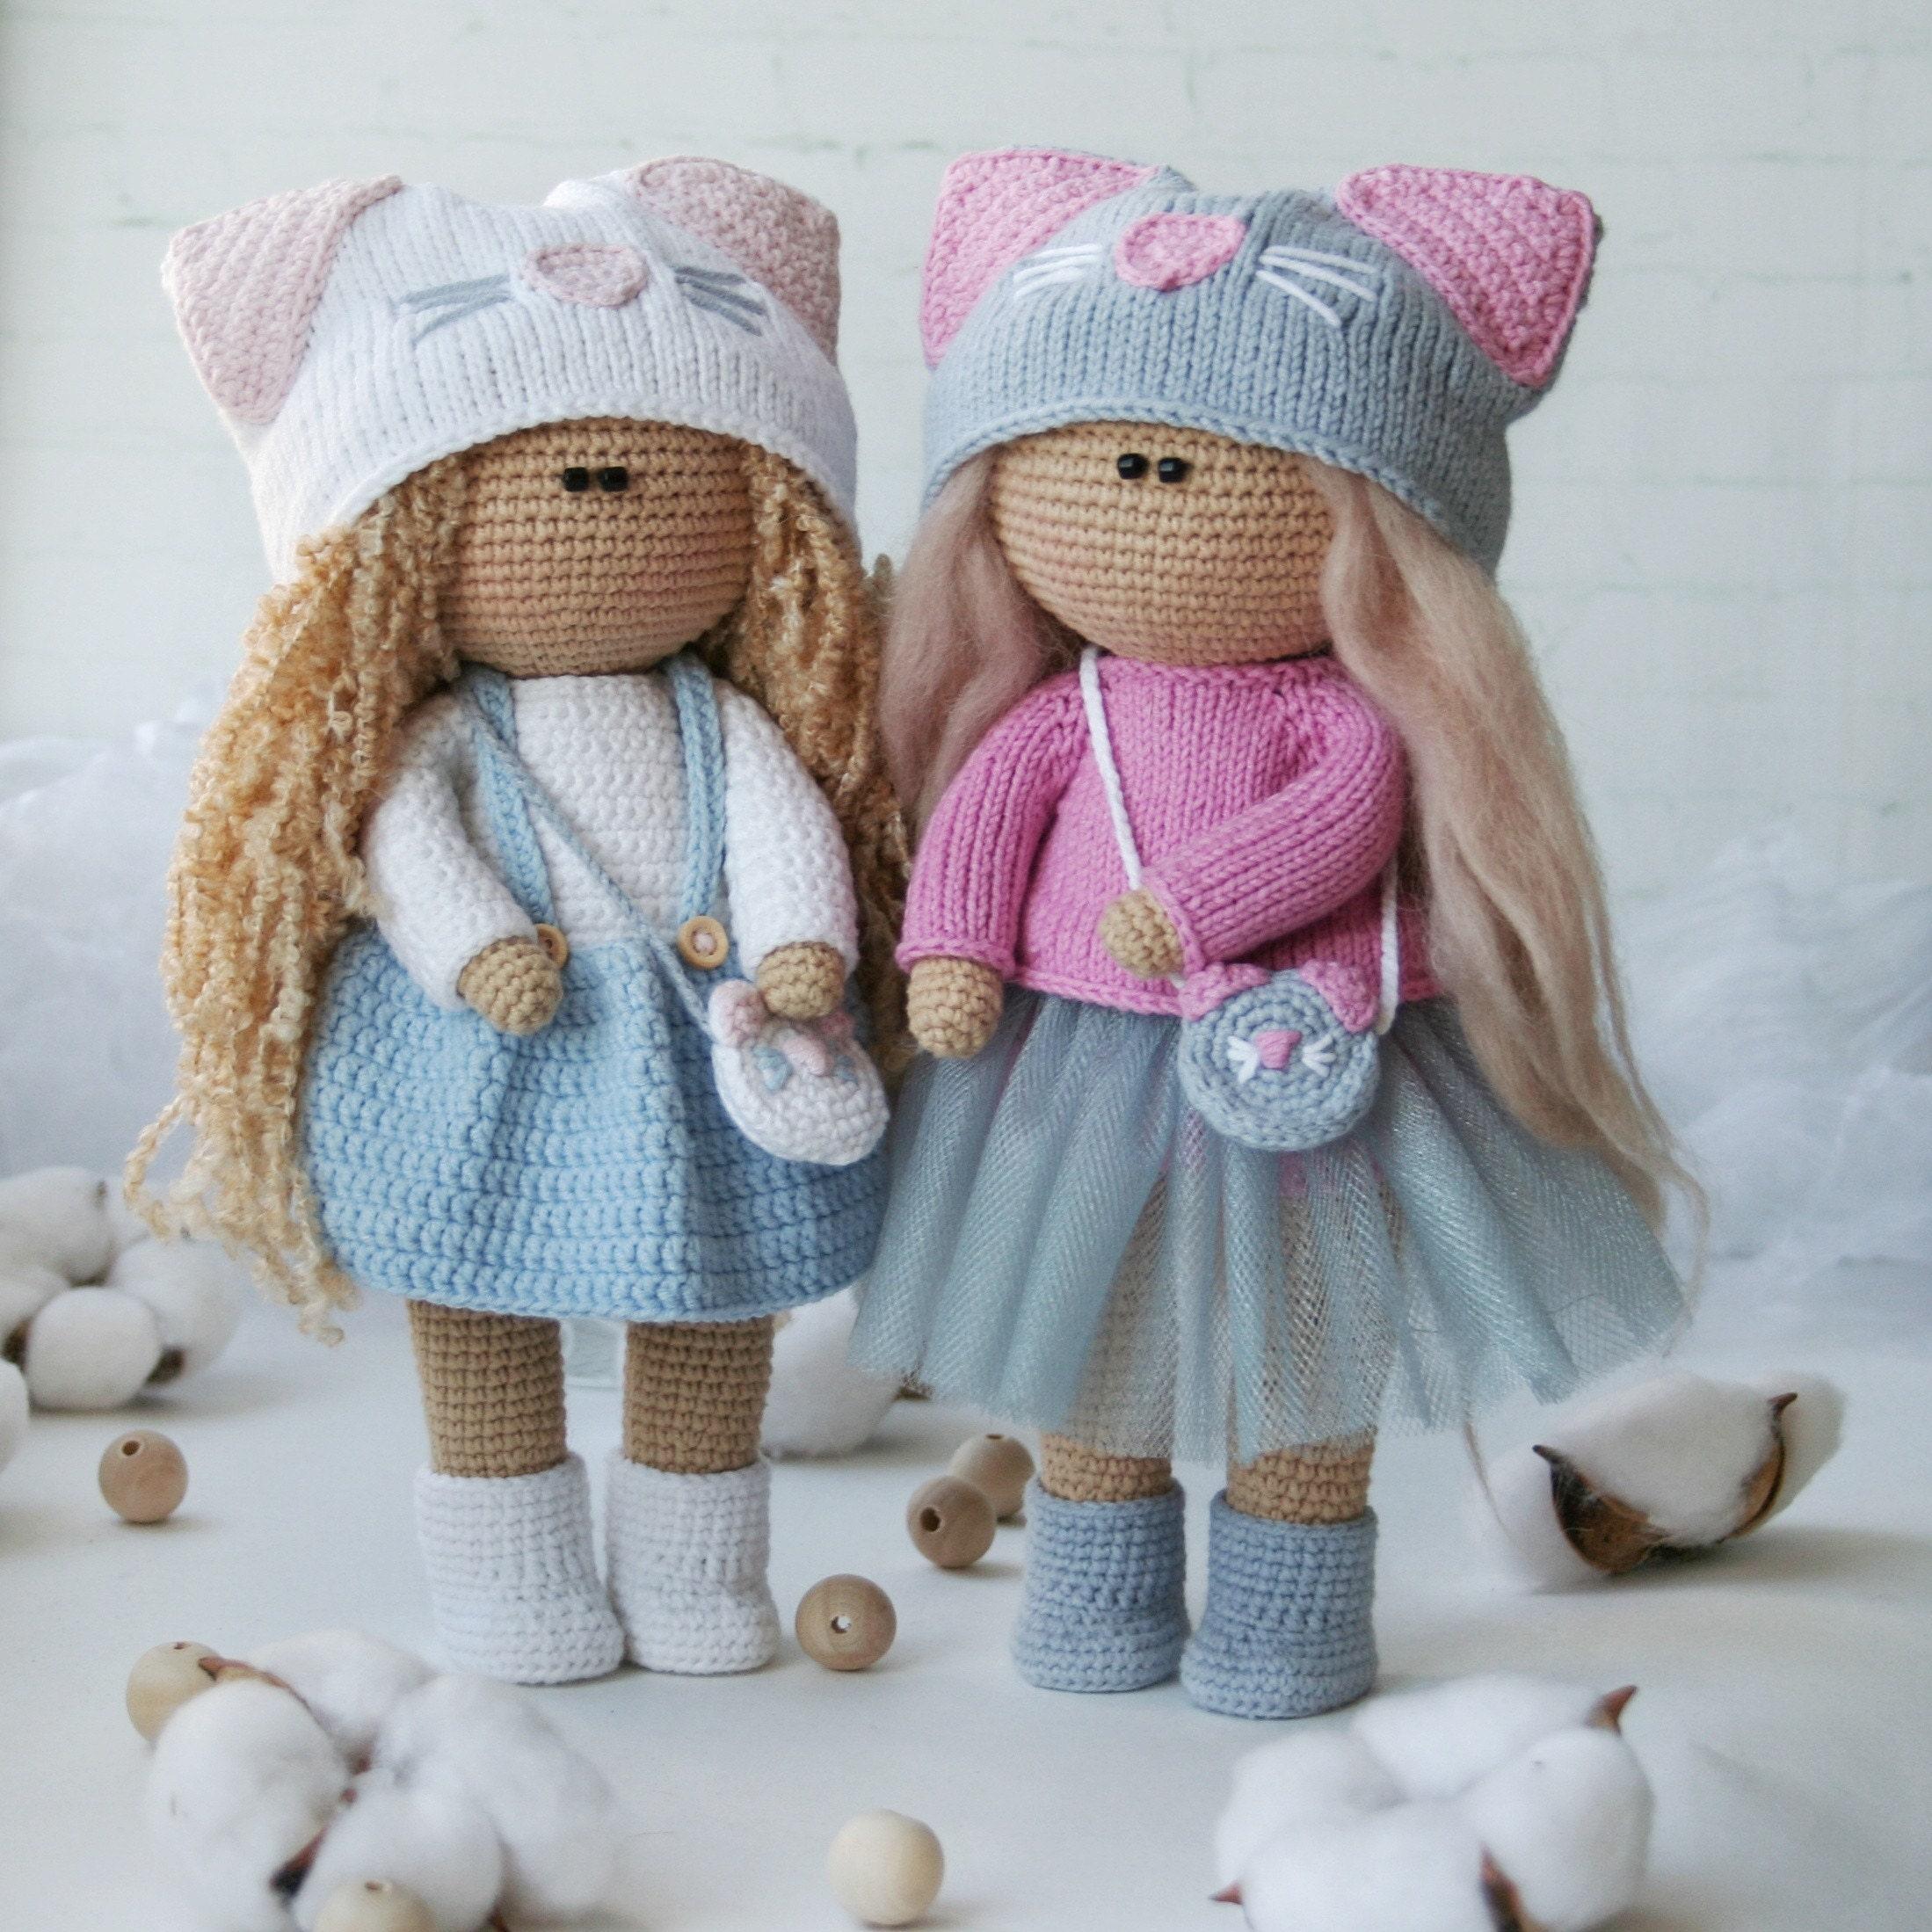 Baby Bean Doll (Free Amigurumi Crochet Pattern, Human Body Doll ... | 2198x2198